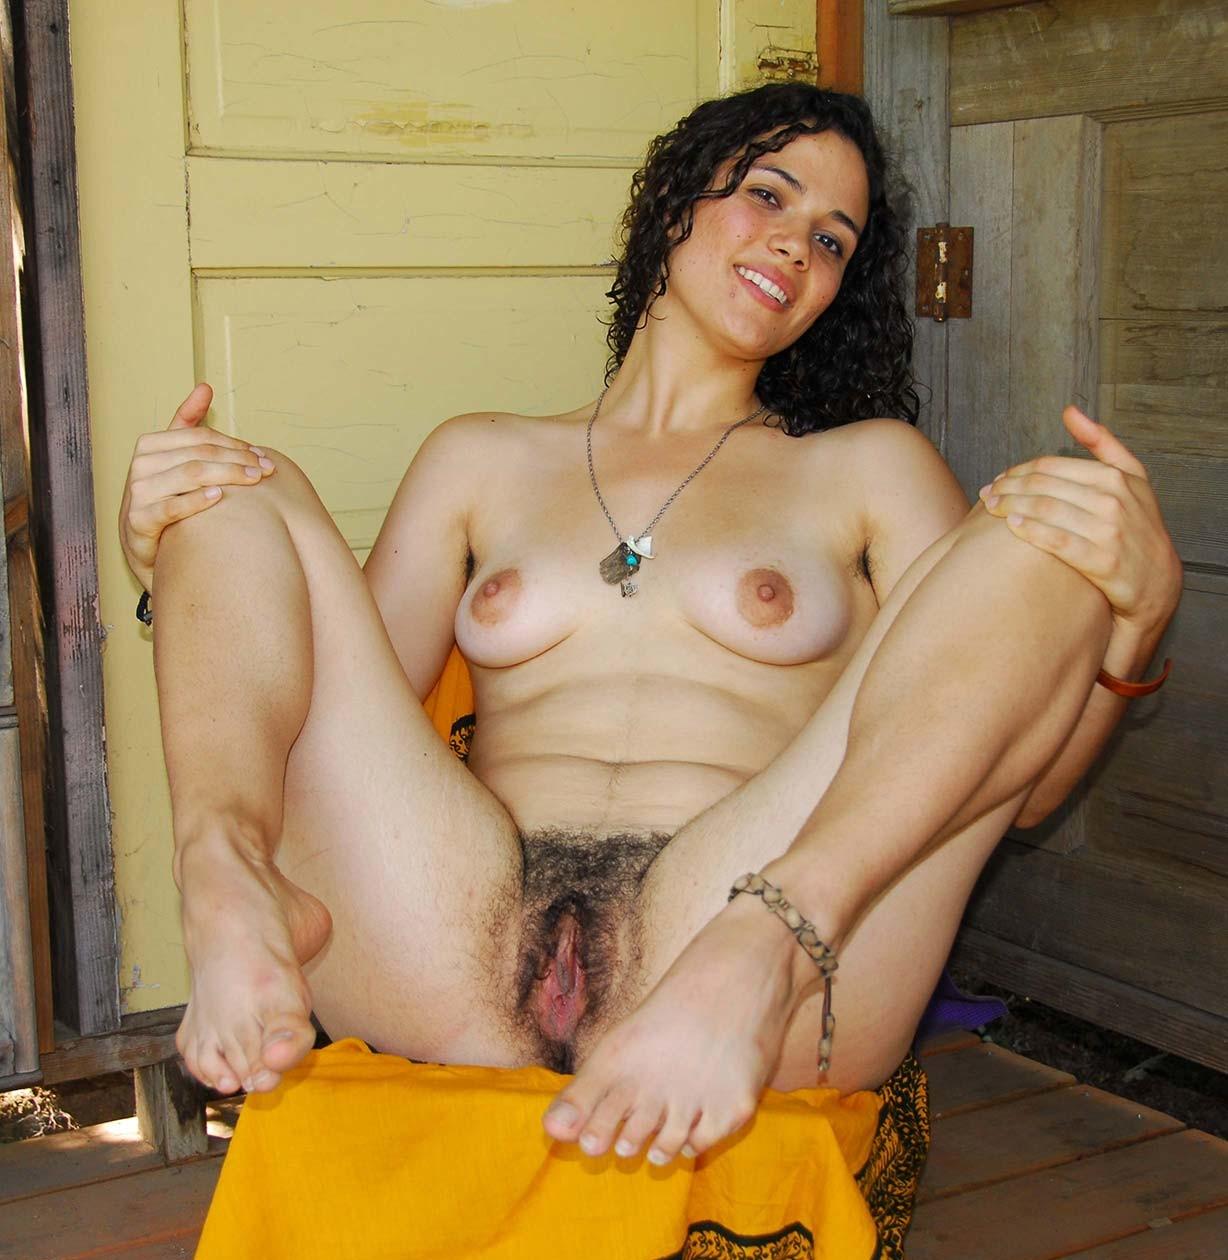 Beautiful very hairy women nude